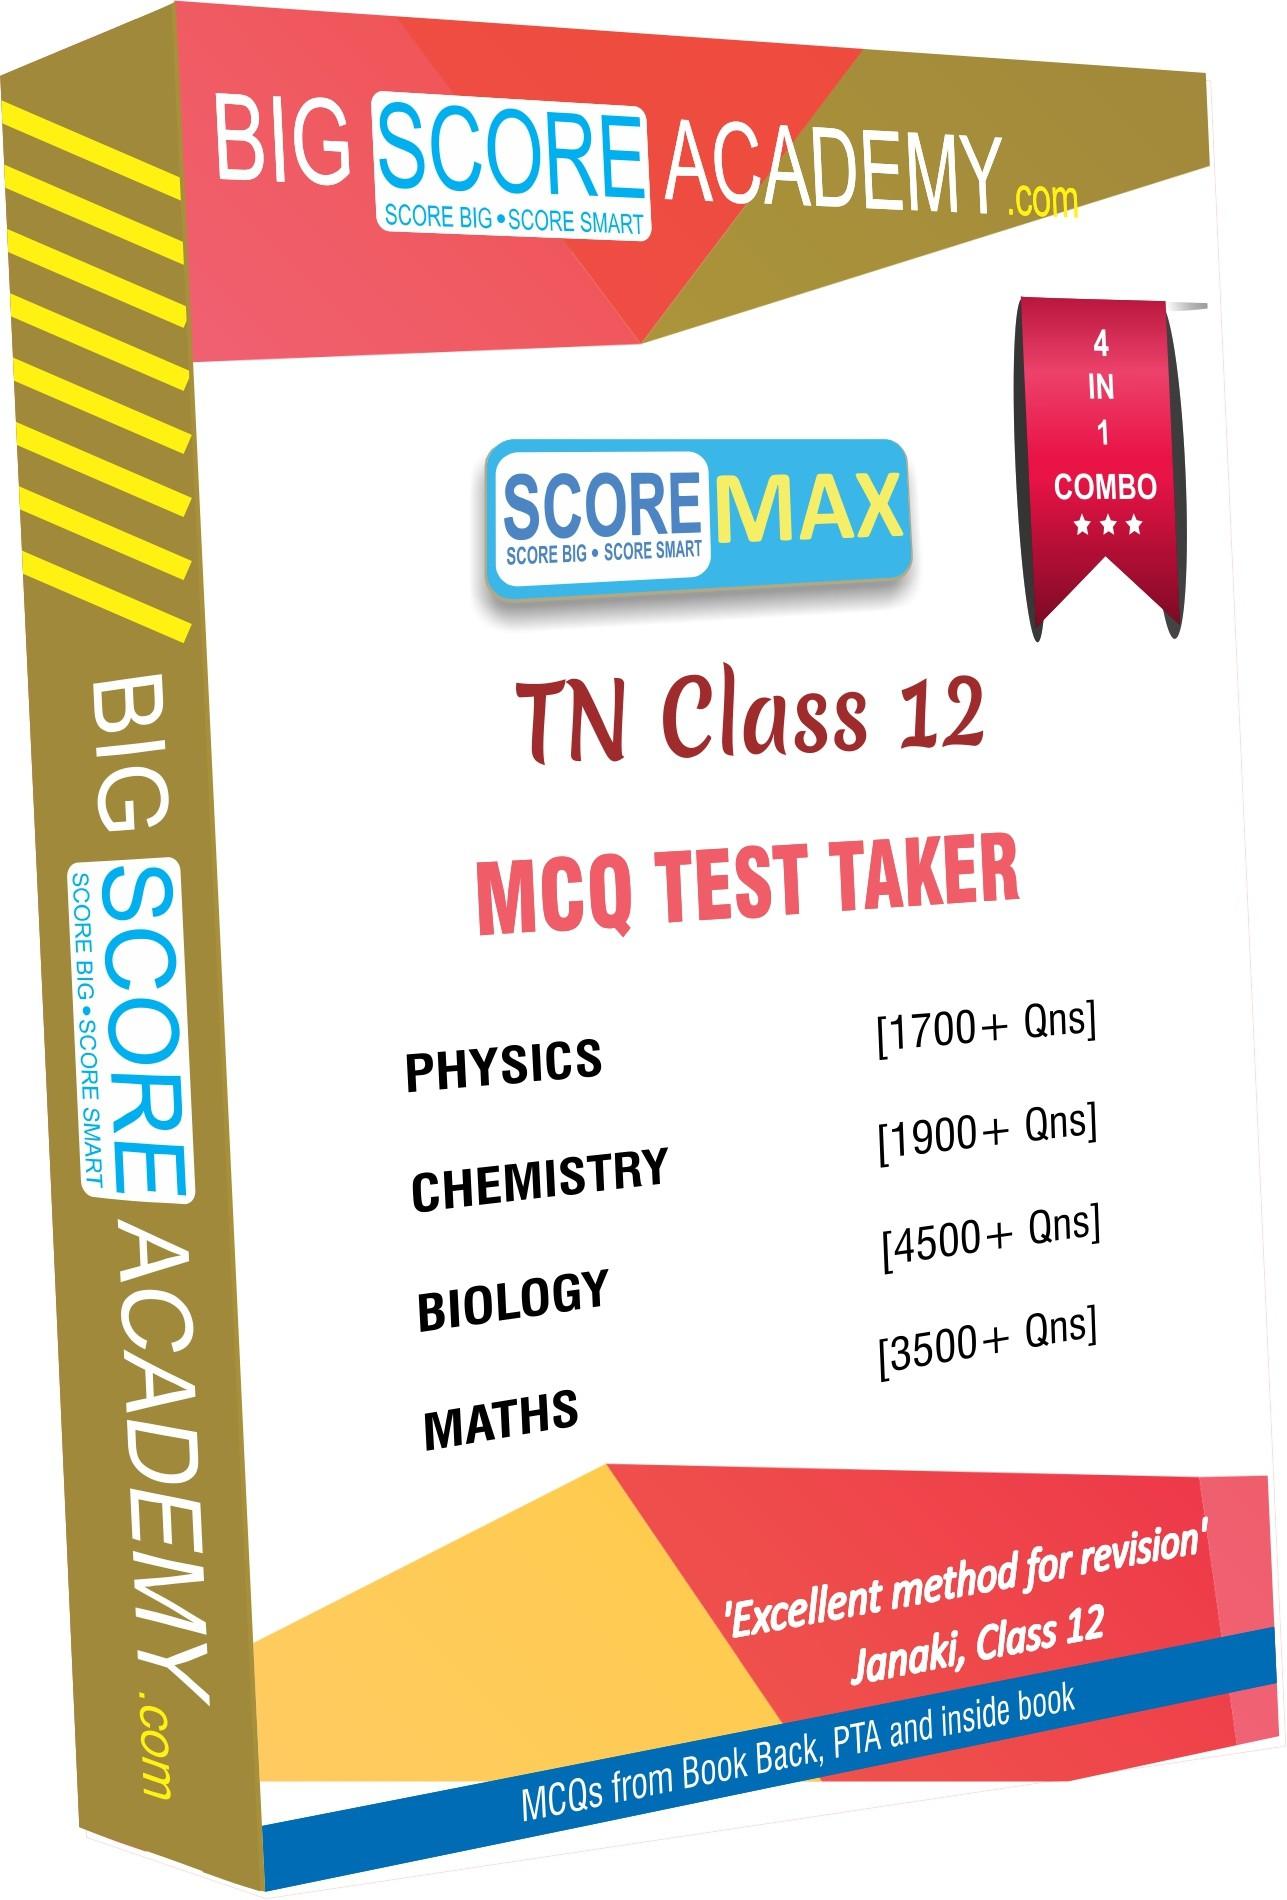 BigScoreAcademy.com Tamil Nadu Samacheer Kalvi Class 12 Combo Pack - One Mark Revision - Physics, Chemistry, Maths and Biology(DVD)